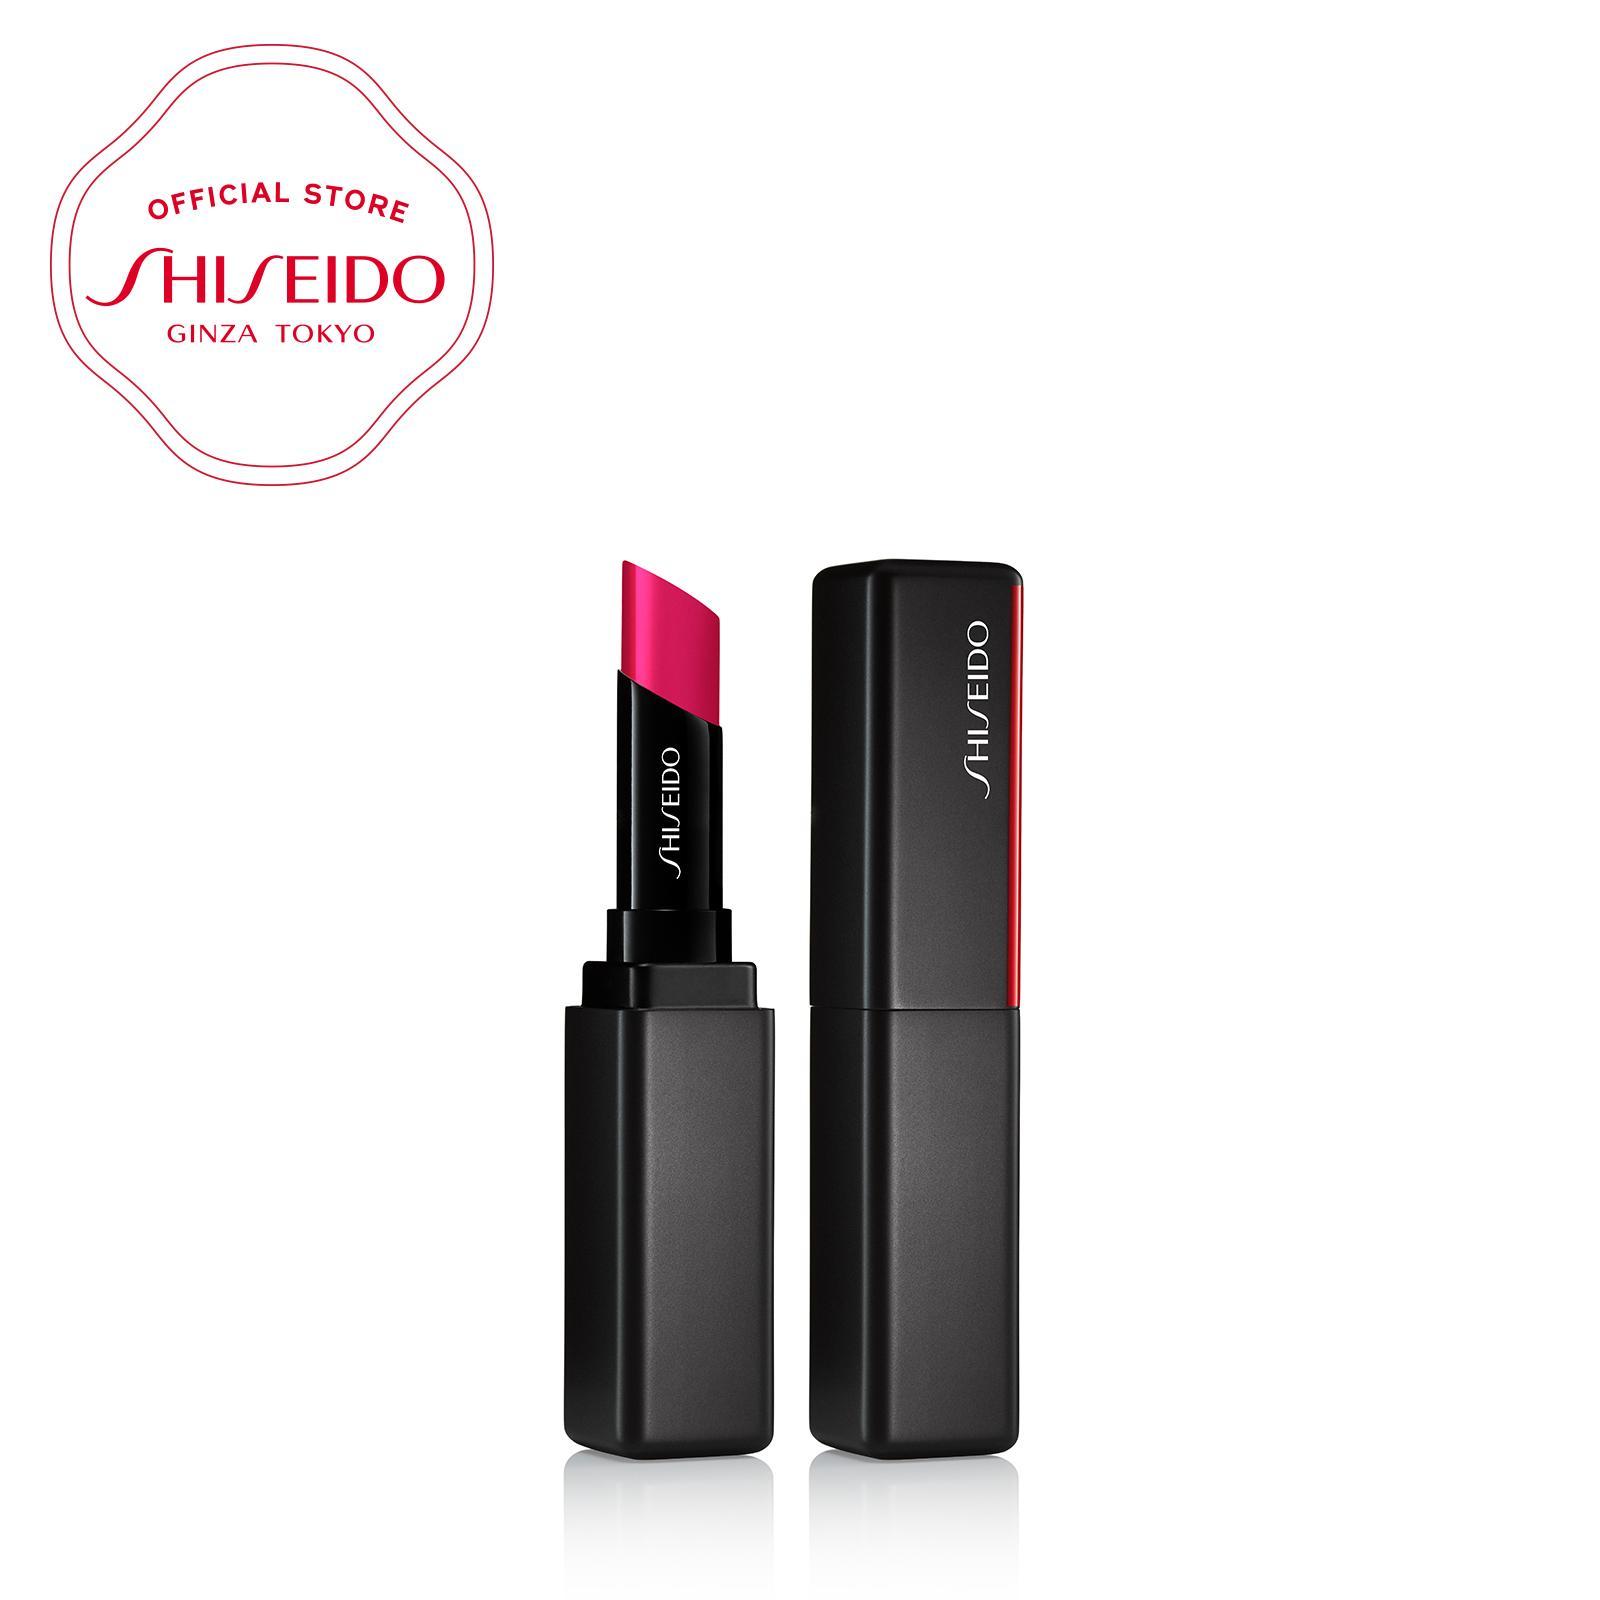 Shiseido Makeup Visionairy Gel Lipstick By Shiseido.